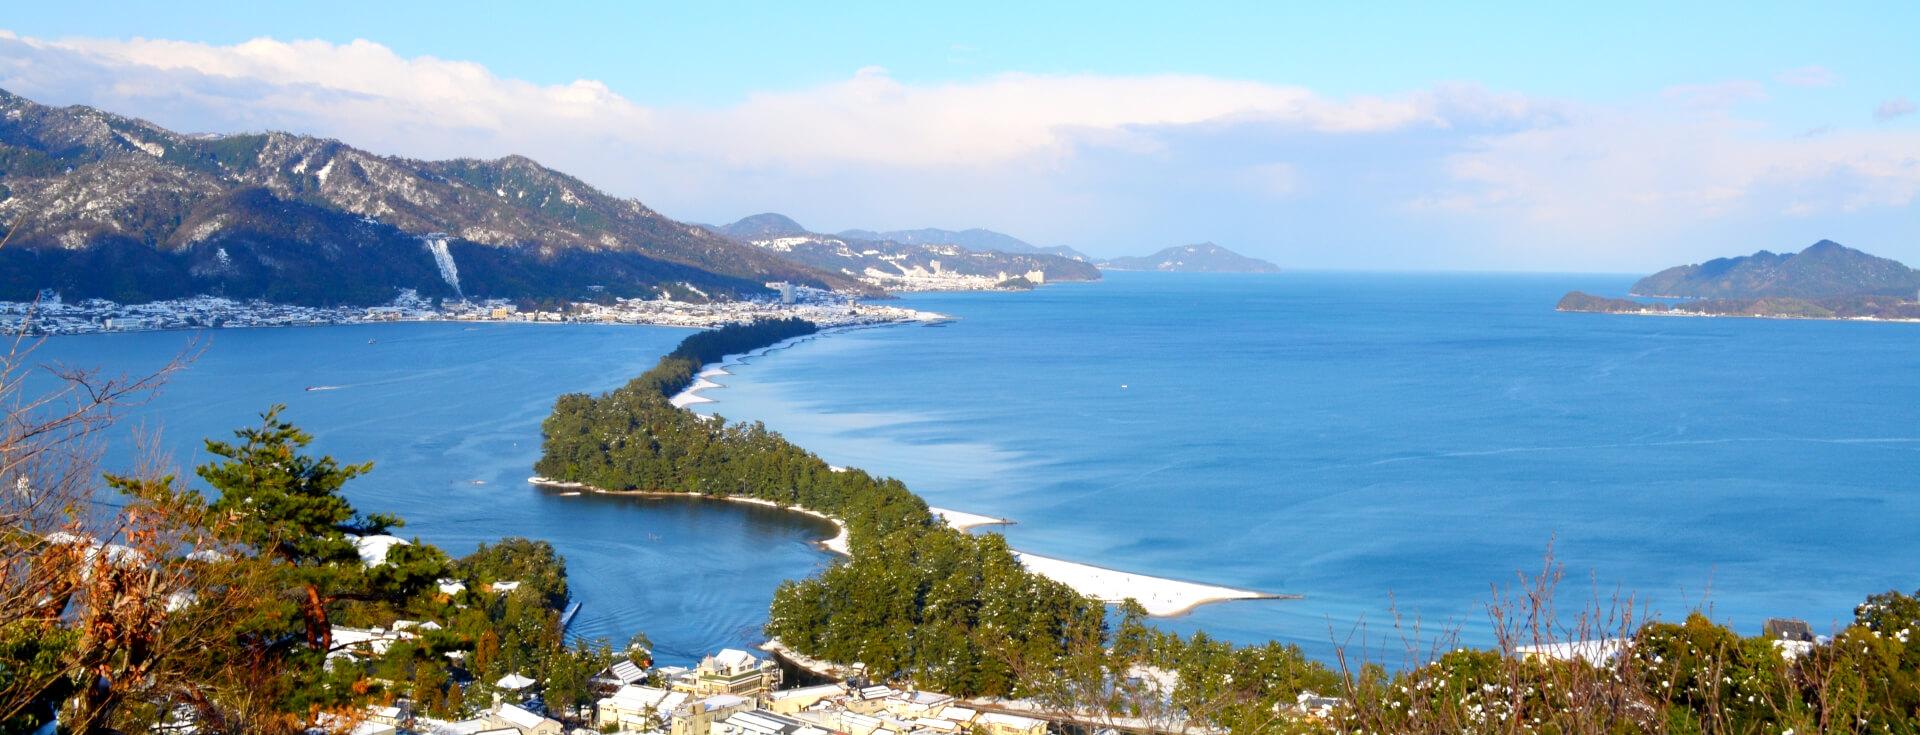 Kyoto Seaside Day Tour from Osaka: Amanohashidate, Ine no Funaya & Kayabuki no sato